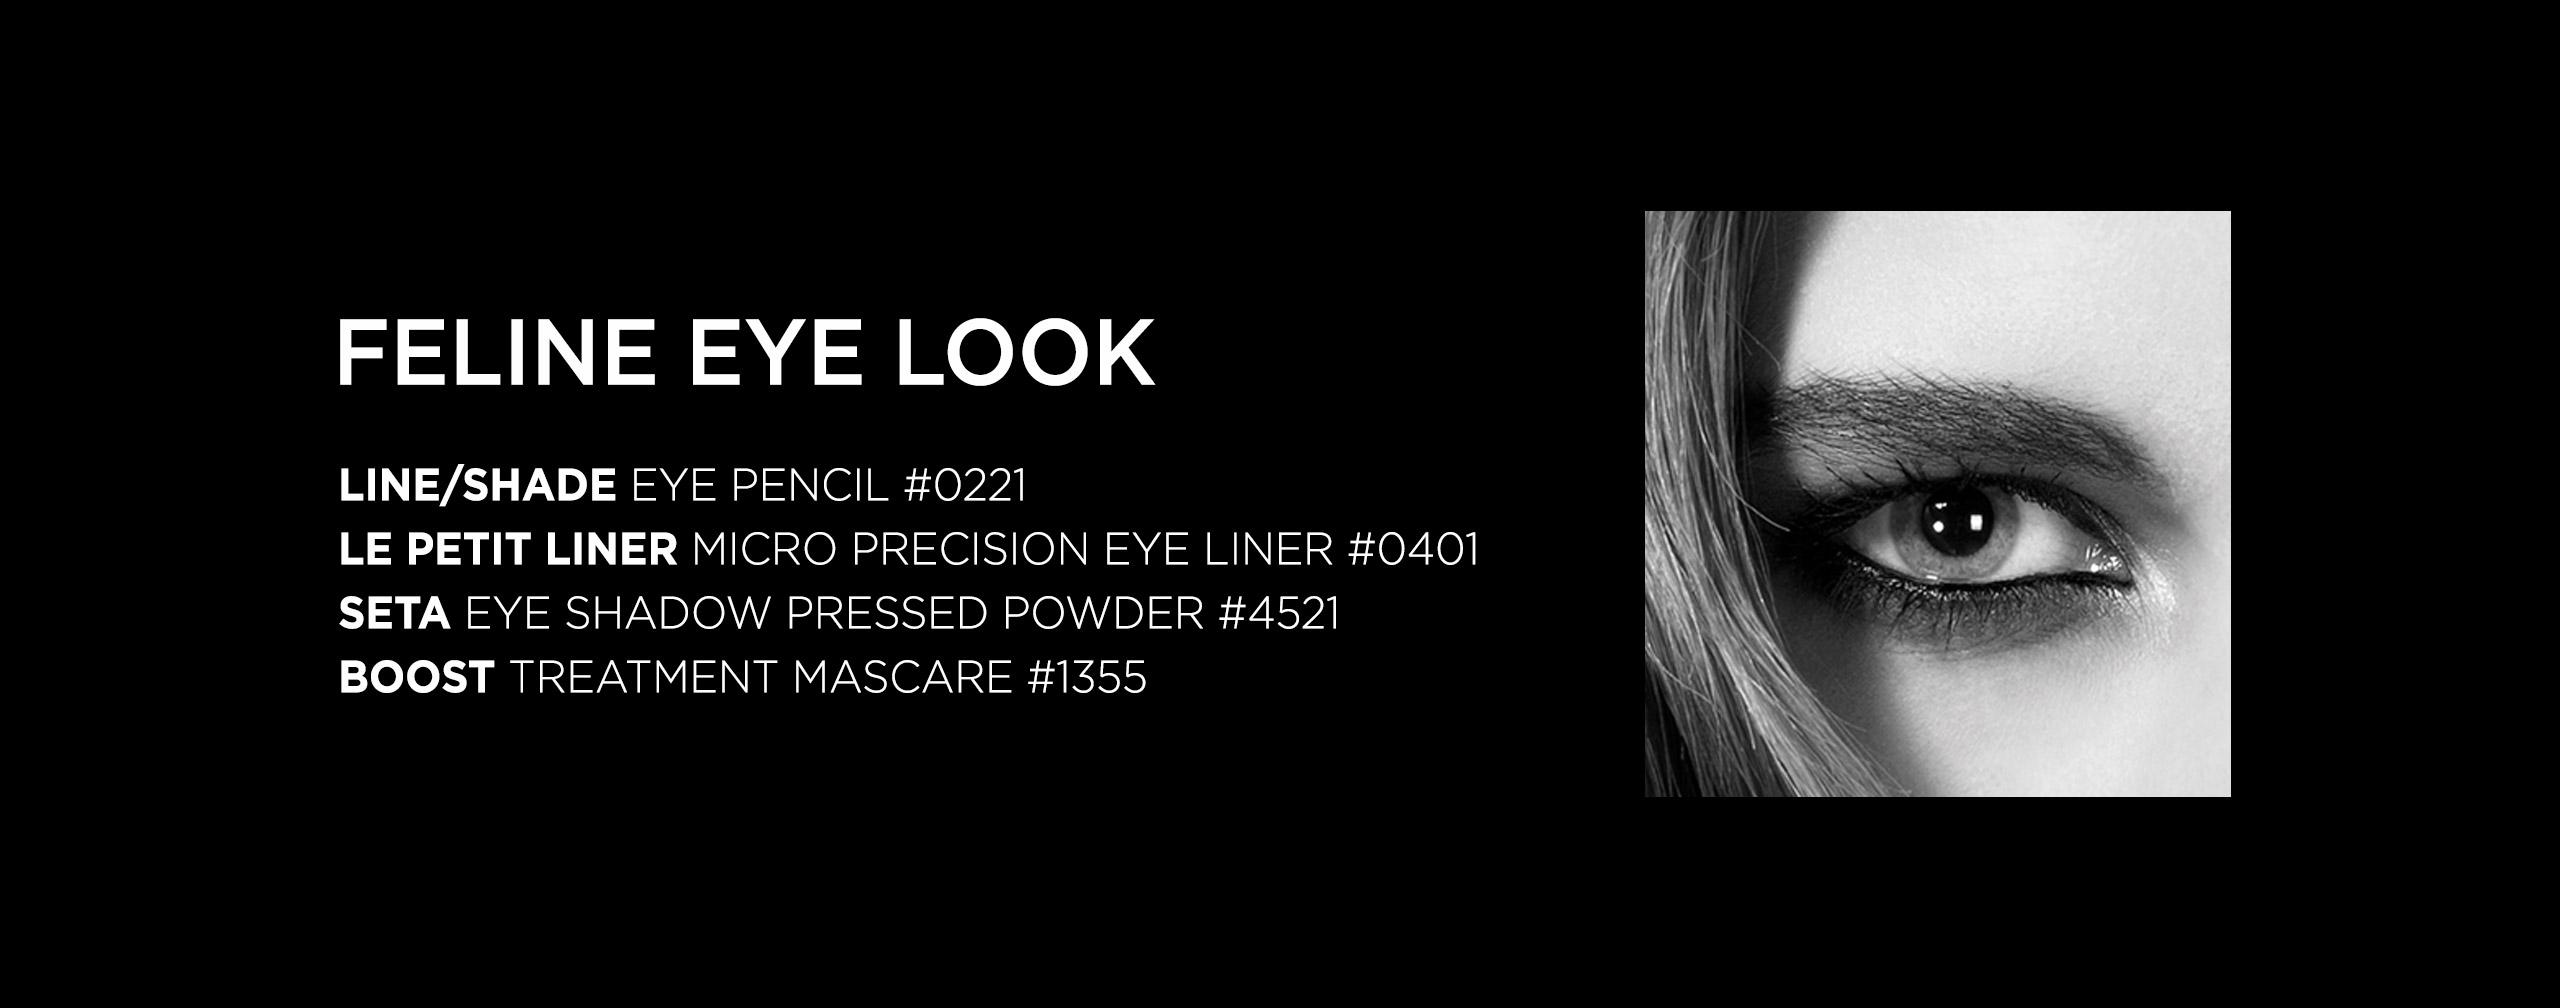 Feline Eye Look